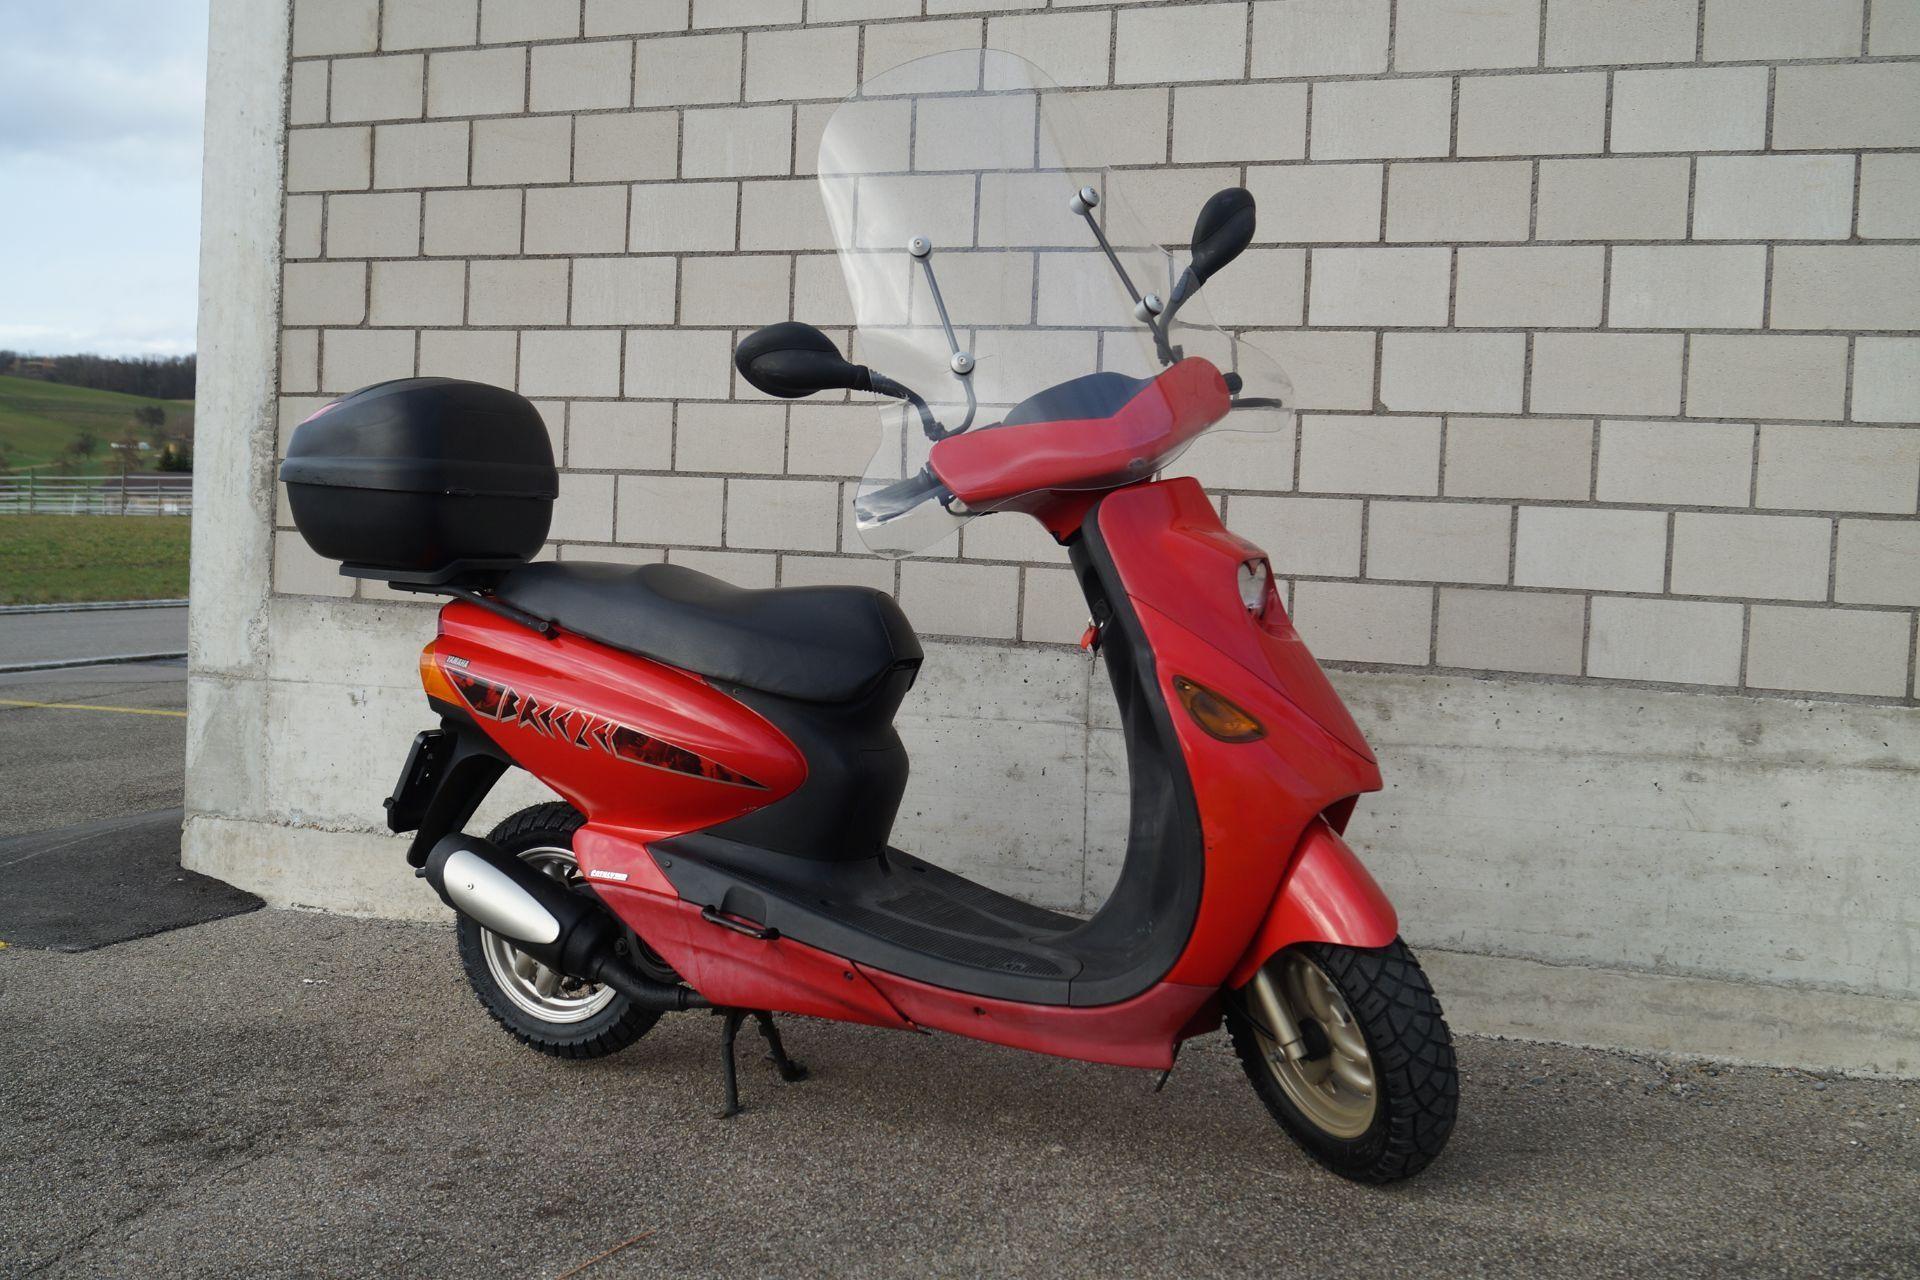 motorrad occasion kaufen yamaha breeze ym 50 motoshop. Black Bedroom Furniture Sets. Home Design Ideas